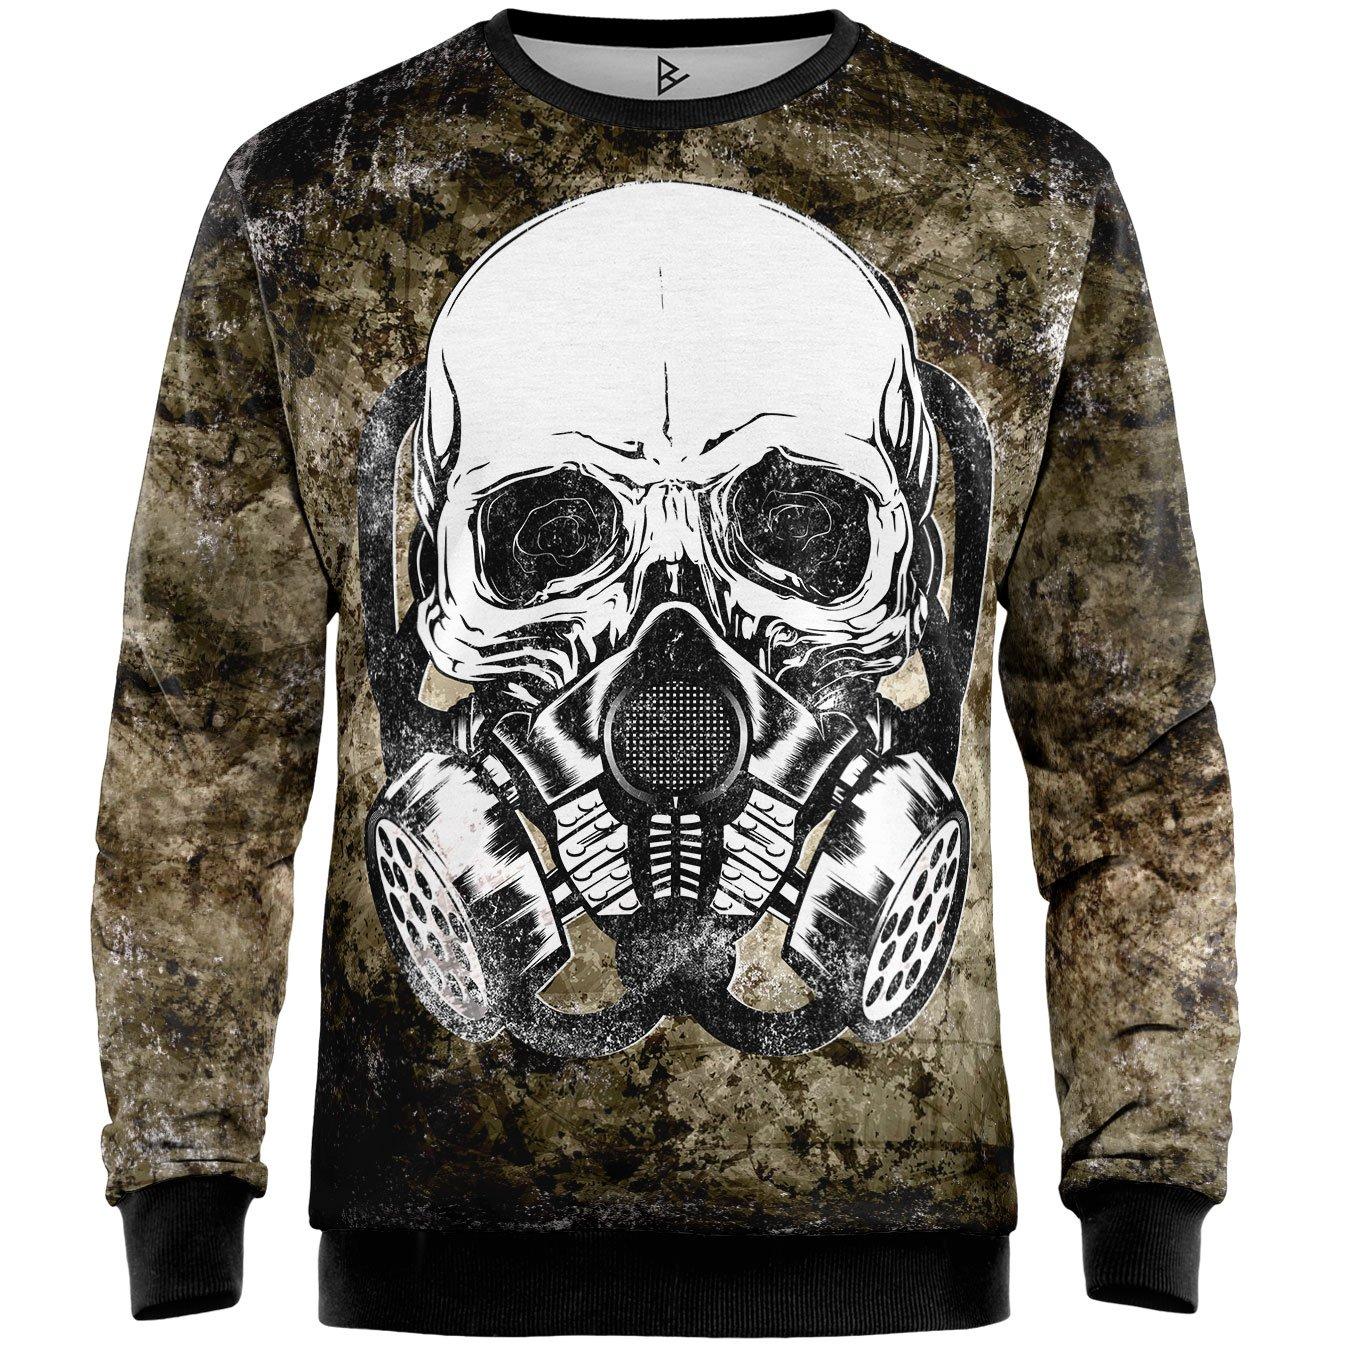 Blowhammer - Sweatshirt Herren - Skull PROTator SWT